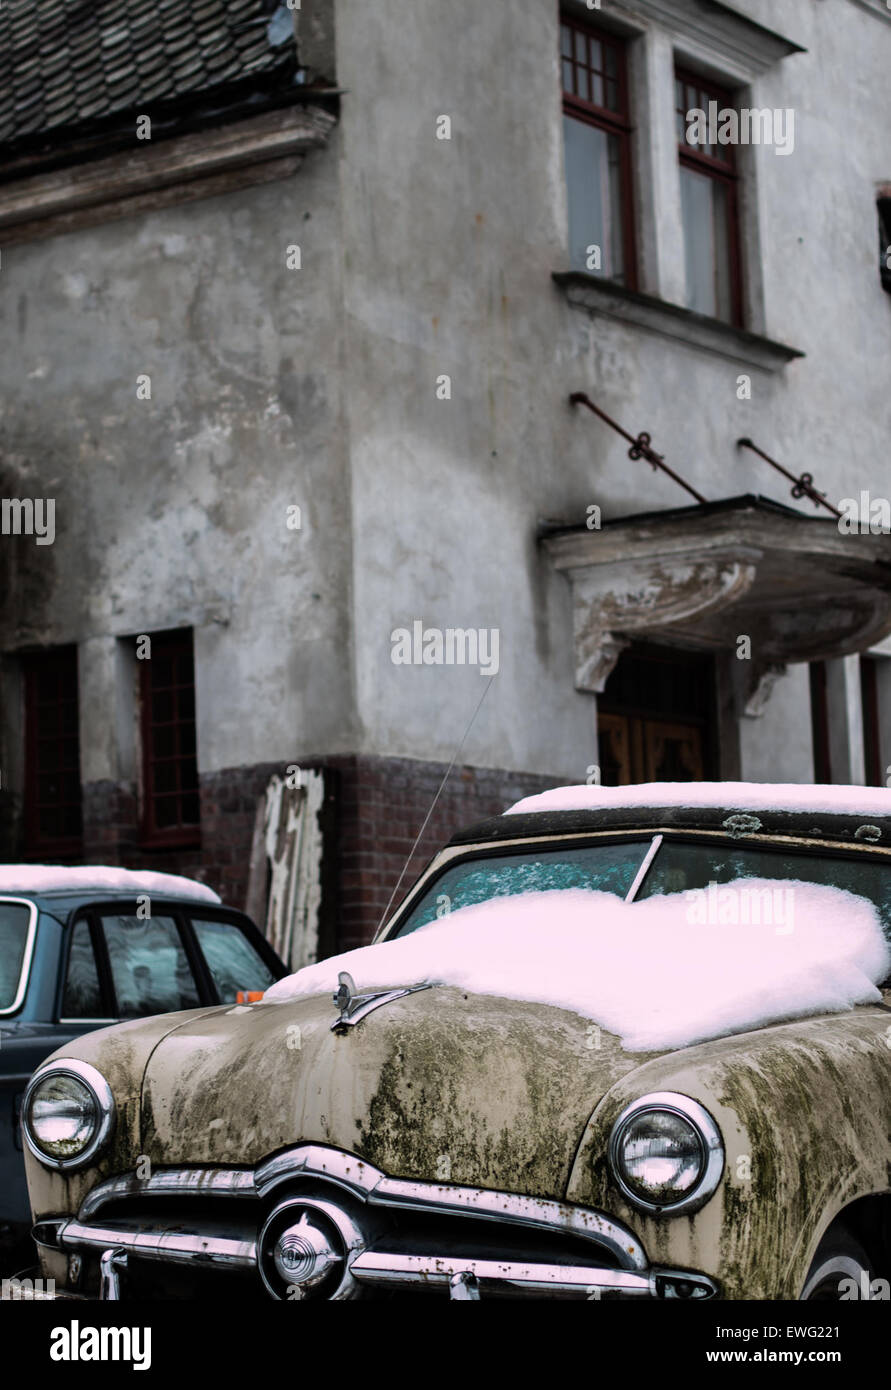 Oldtimer mit Schnee auf Kapuze Vintage Oldtimer Automobil Auto Schnee vintage Stockbild